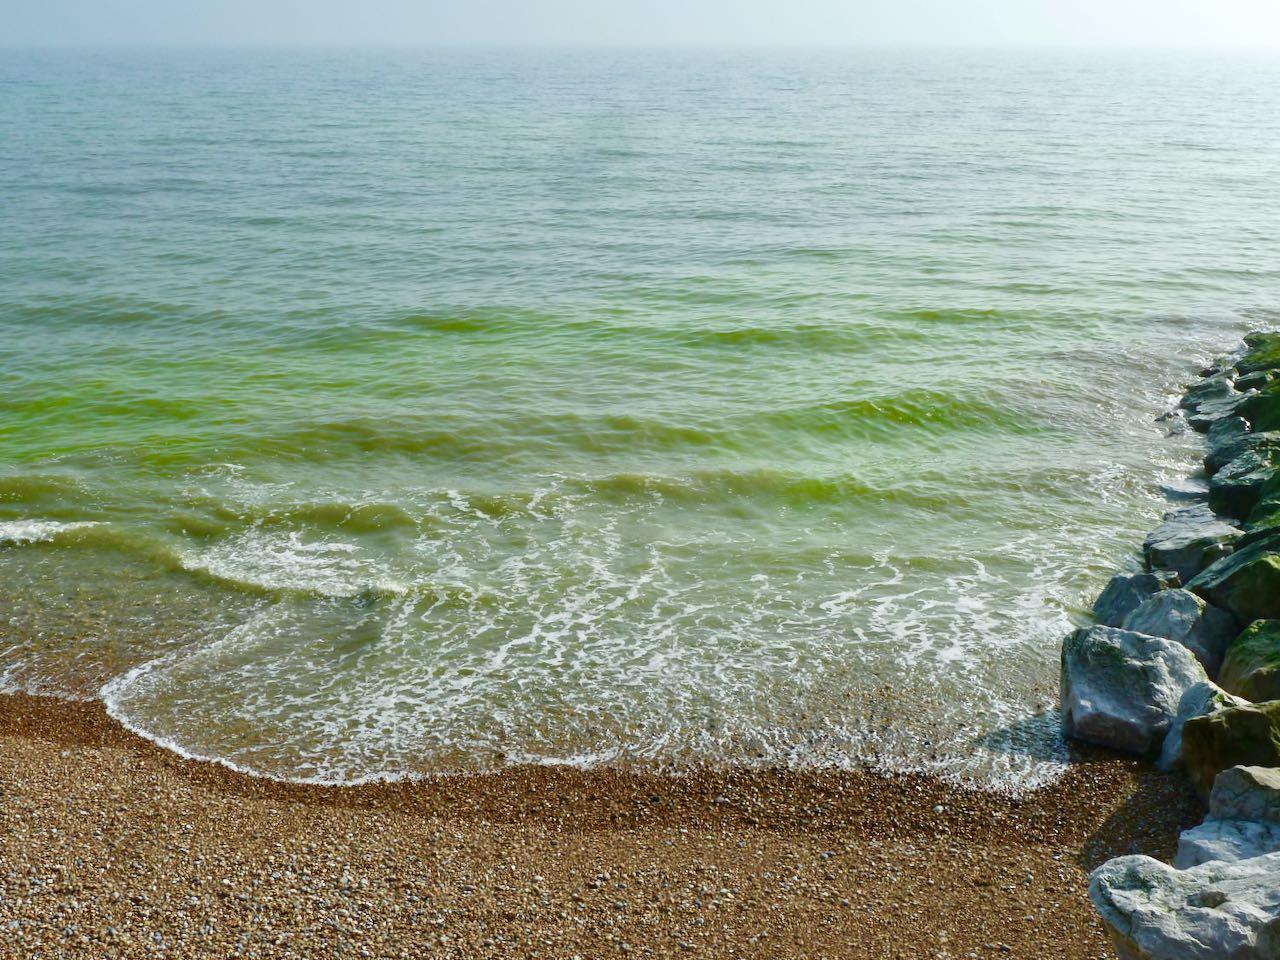 Green sea algae seen of St Leonards, East Sussex